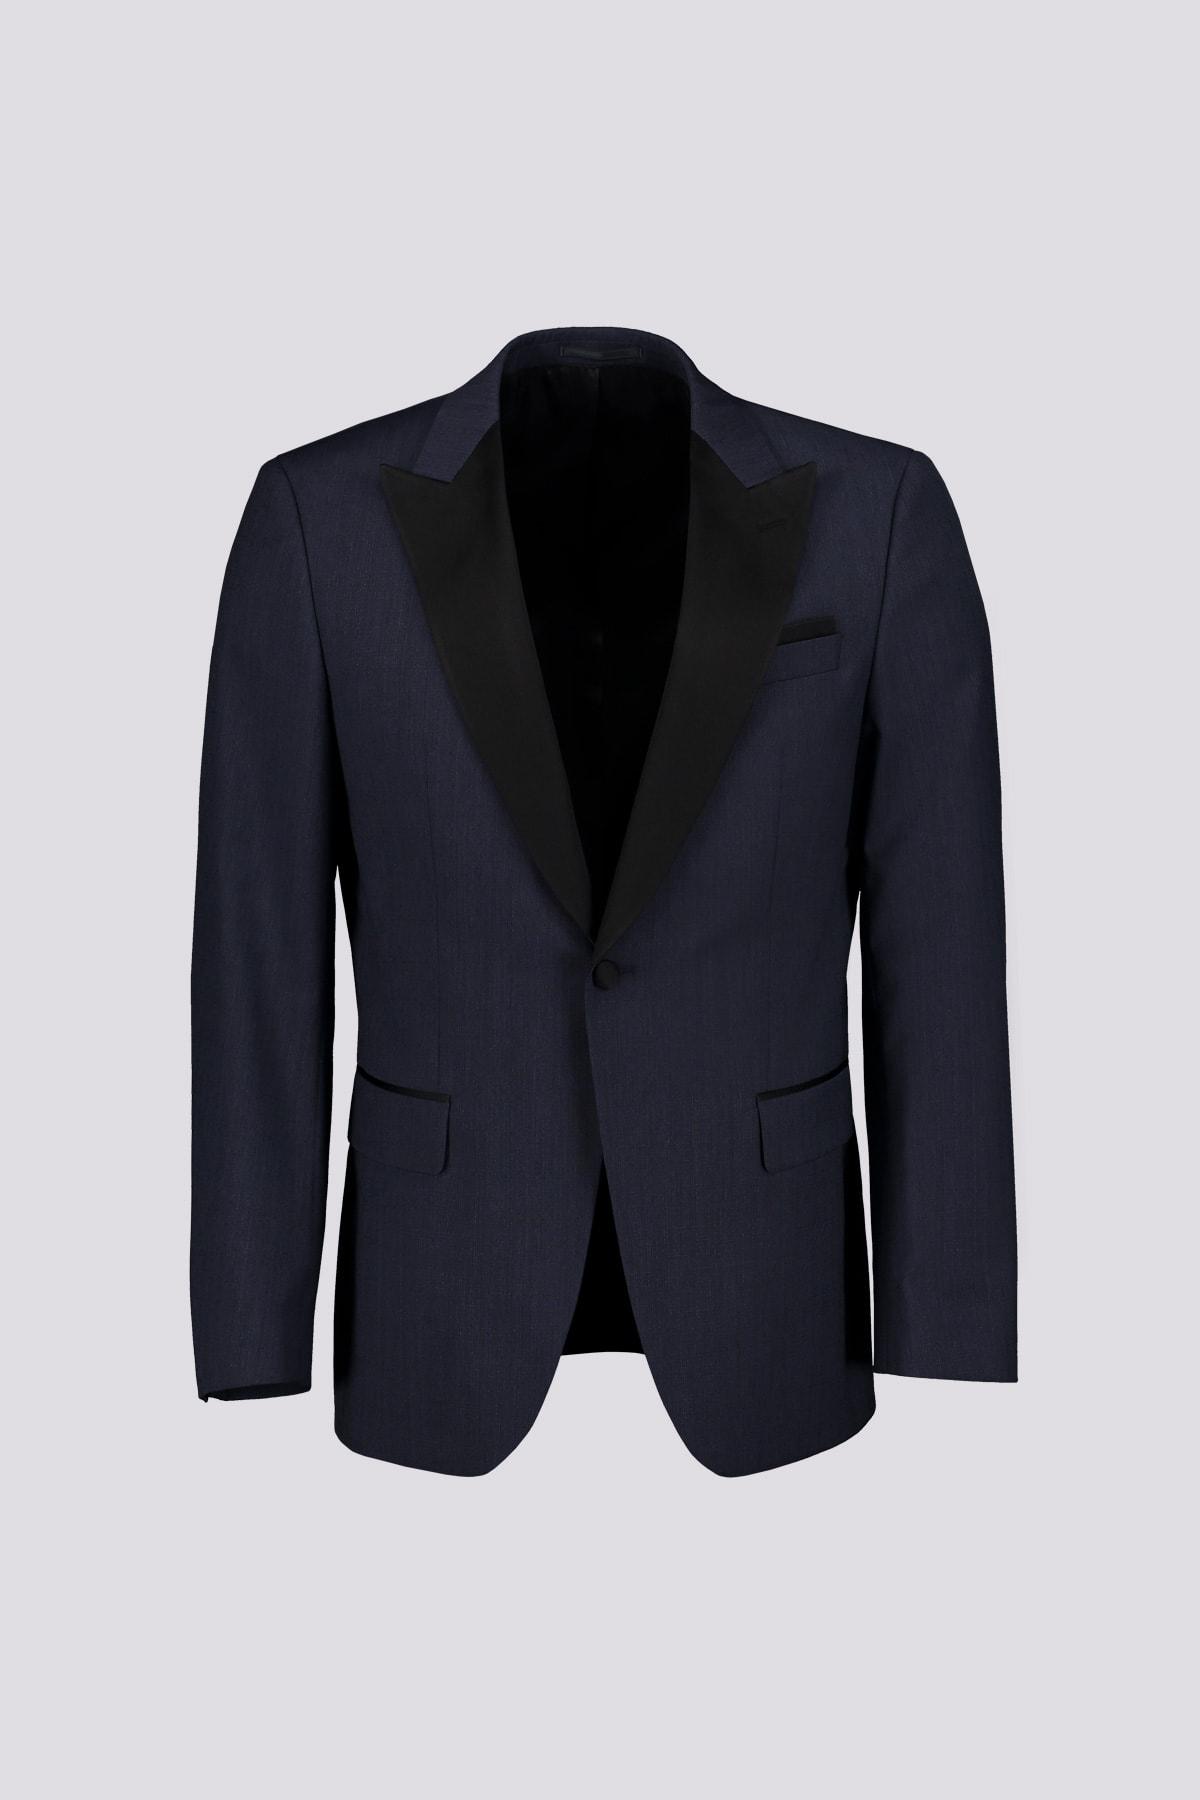 SMOKING  marca BOSS slim fit en lana virgen melange azul